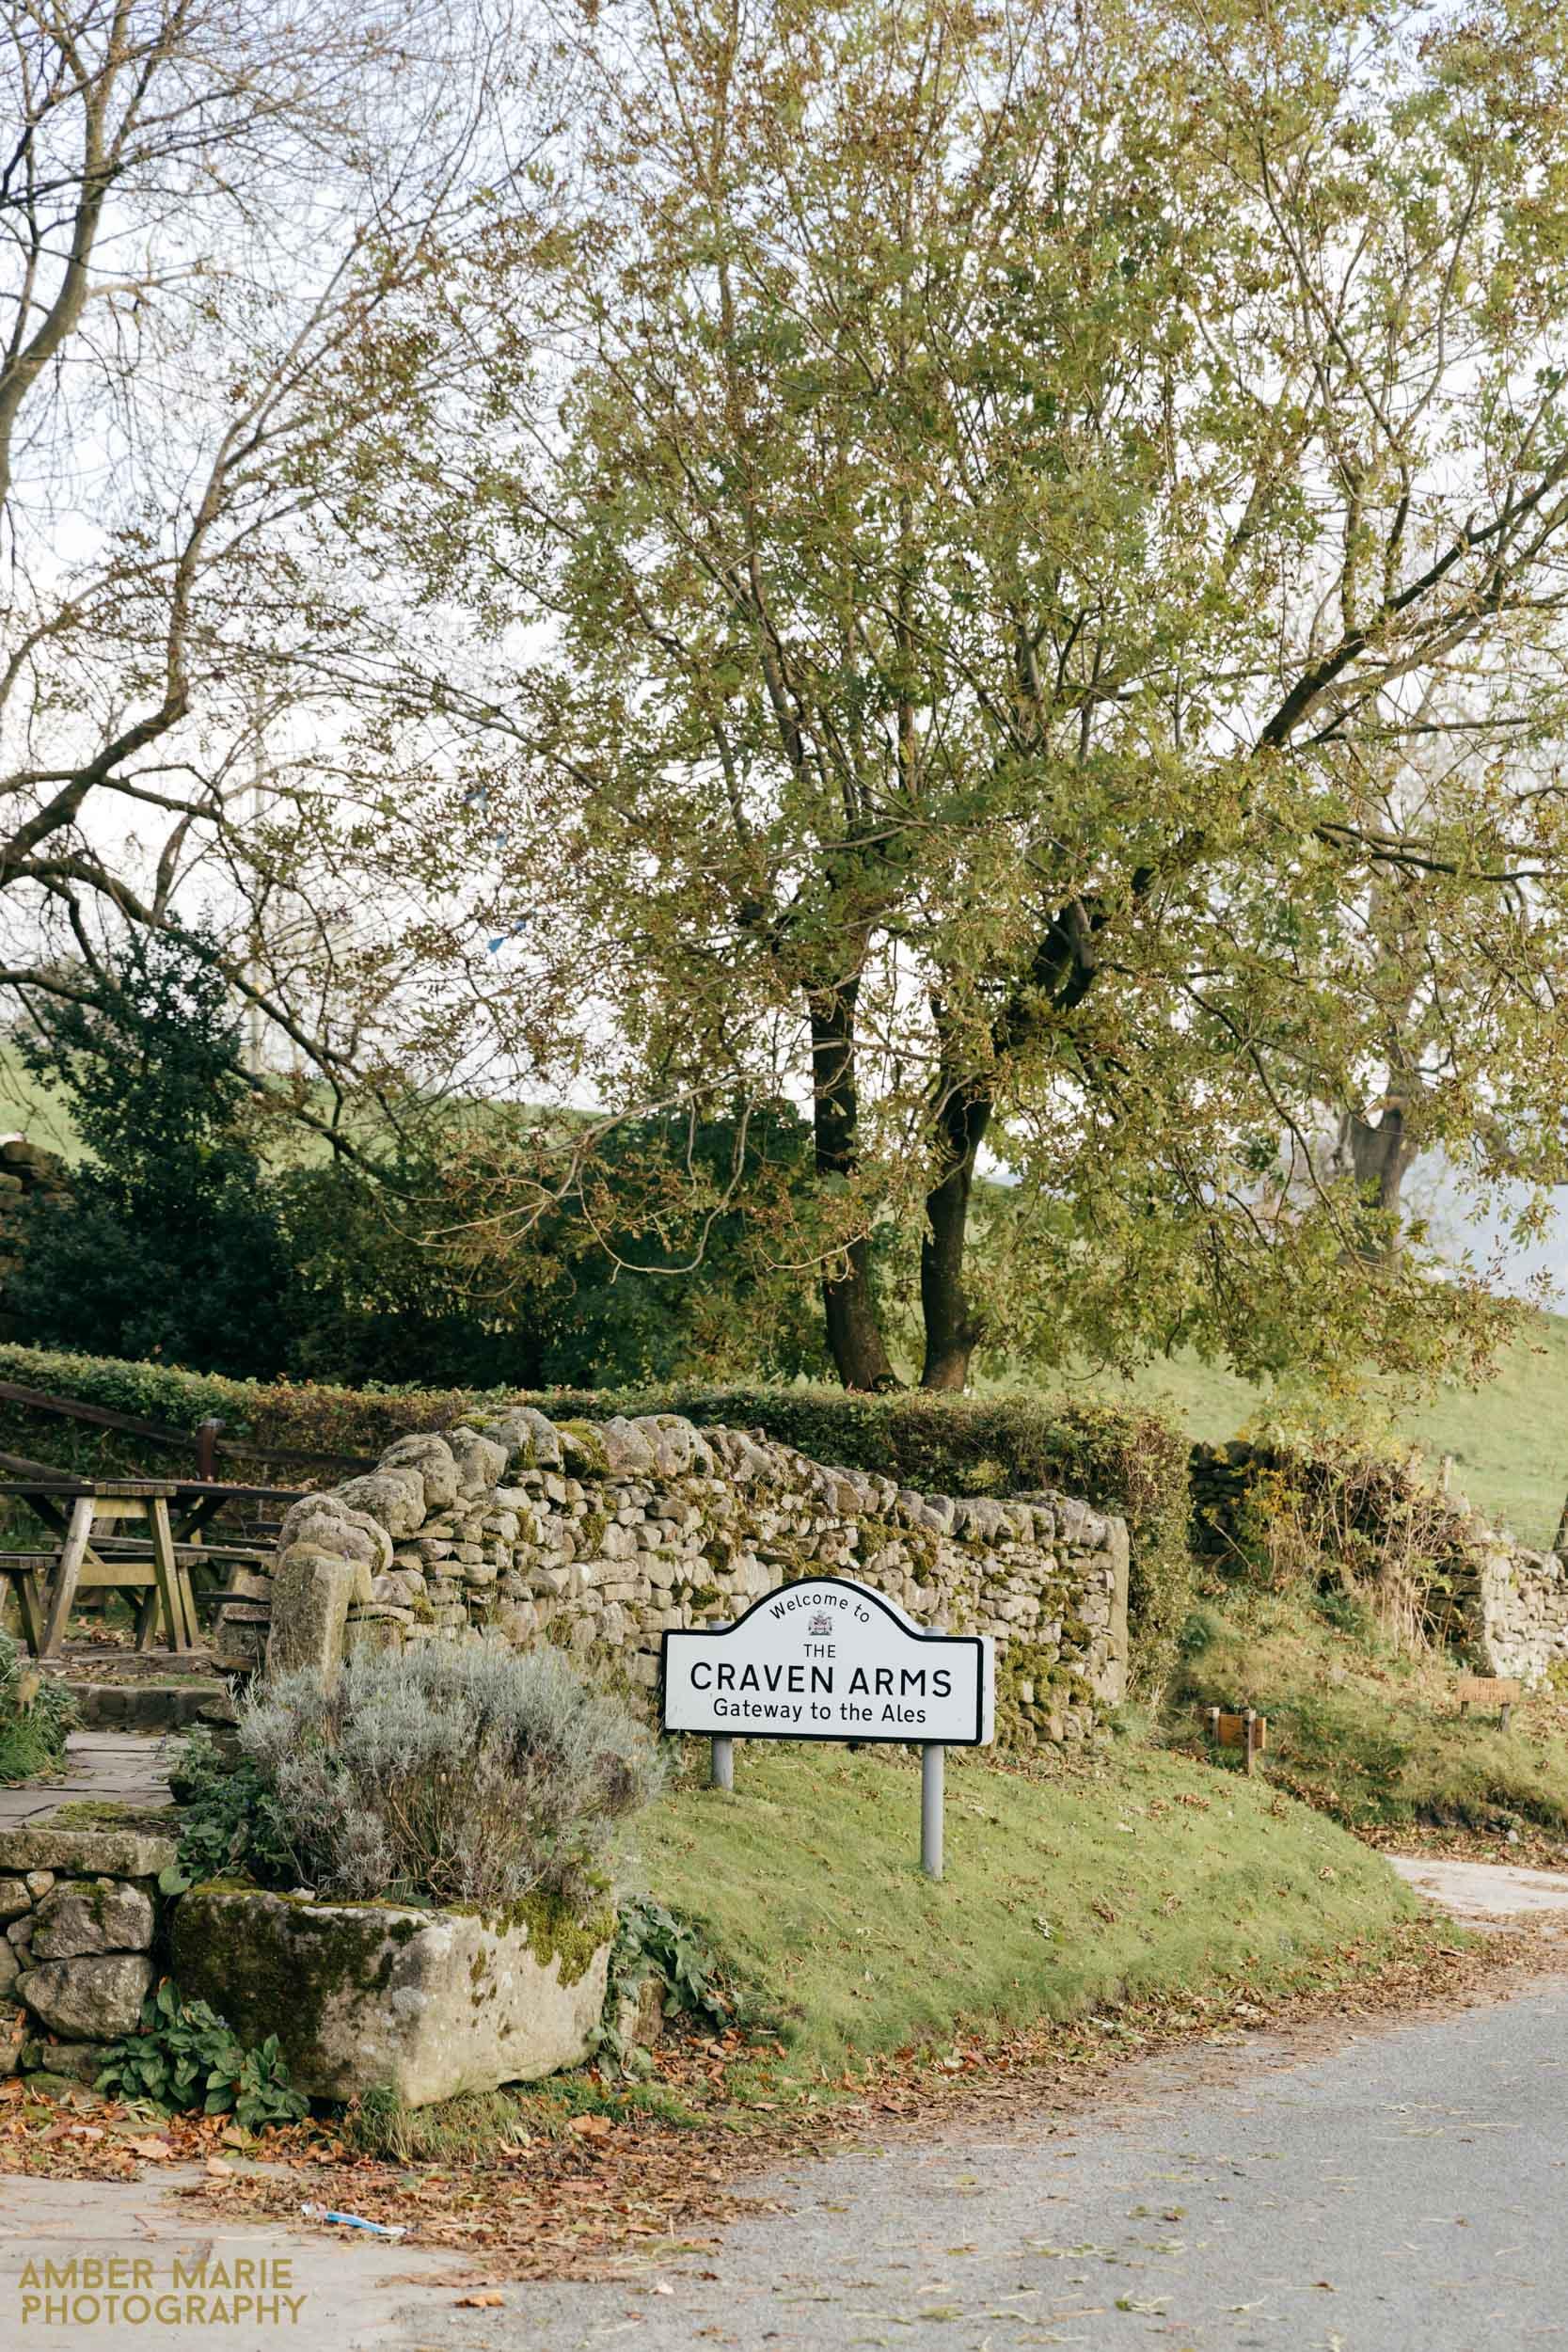 Appletreewick